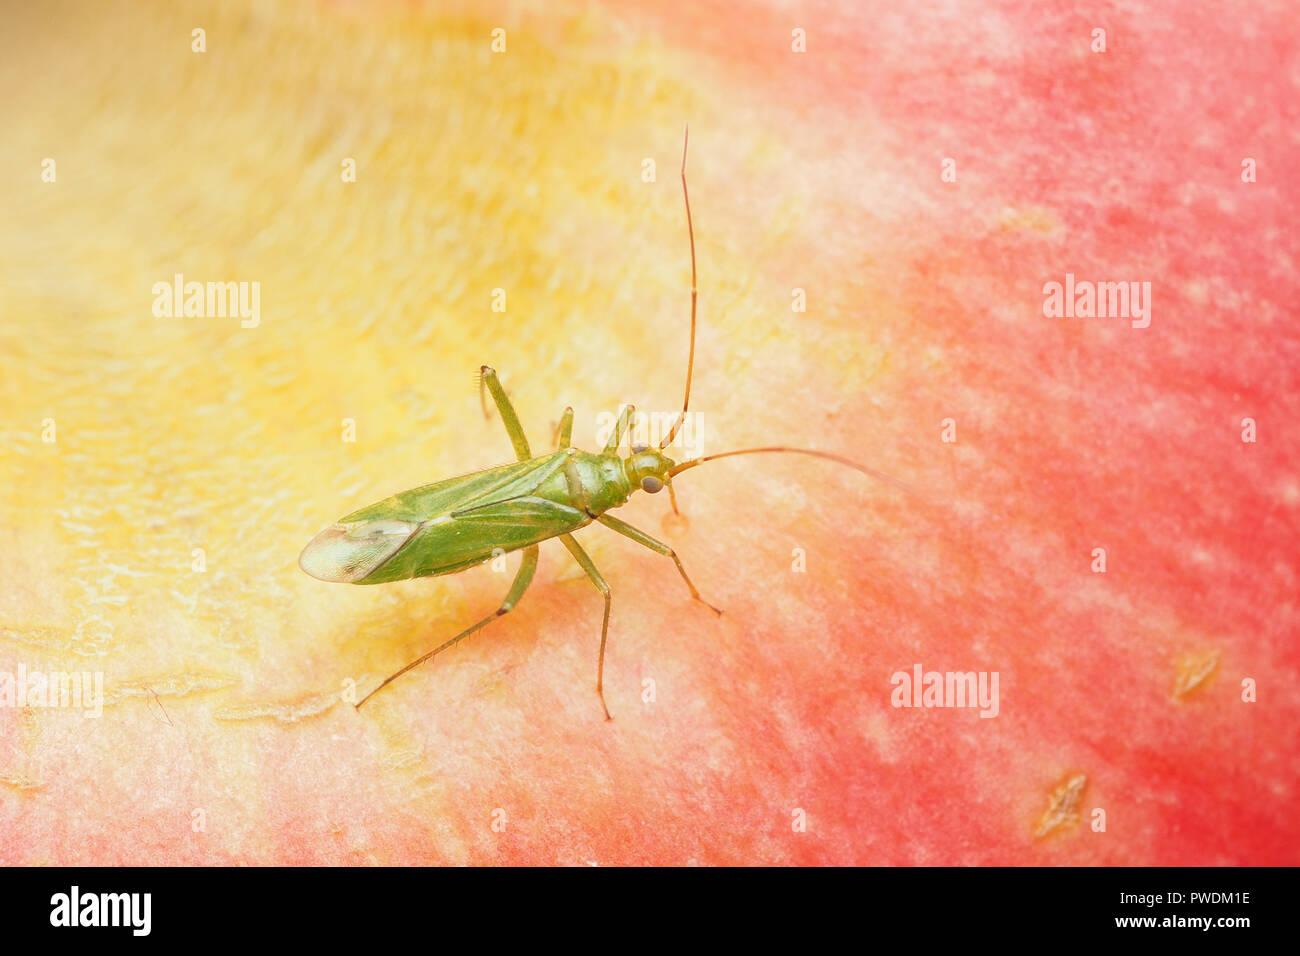 Green Capsid bug (Blepharidopterus angulatus) on an apple. Tipperary, Ireland - Stock Image